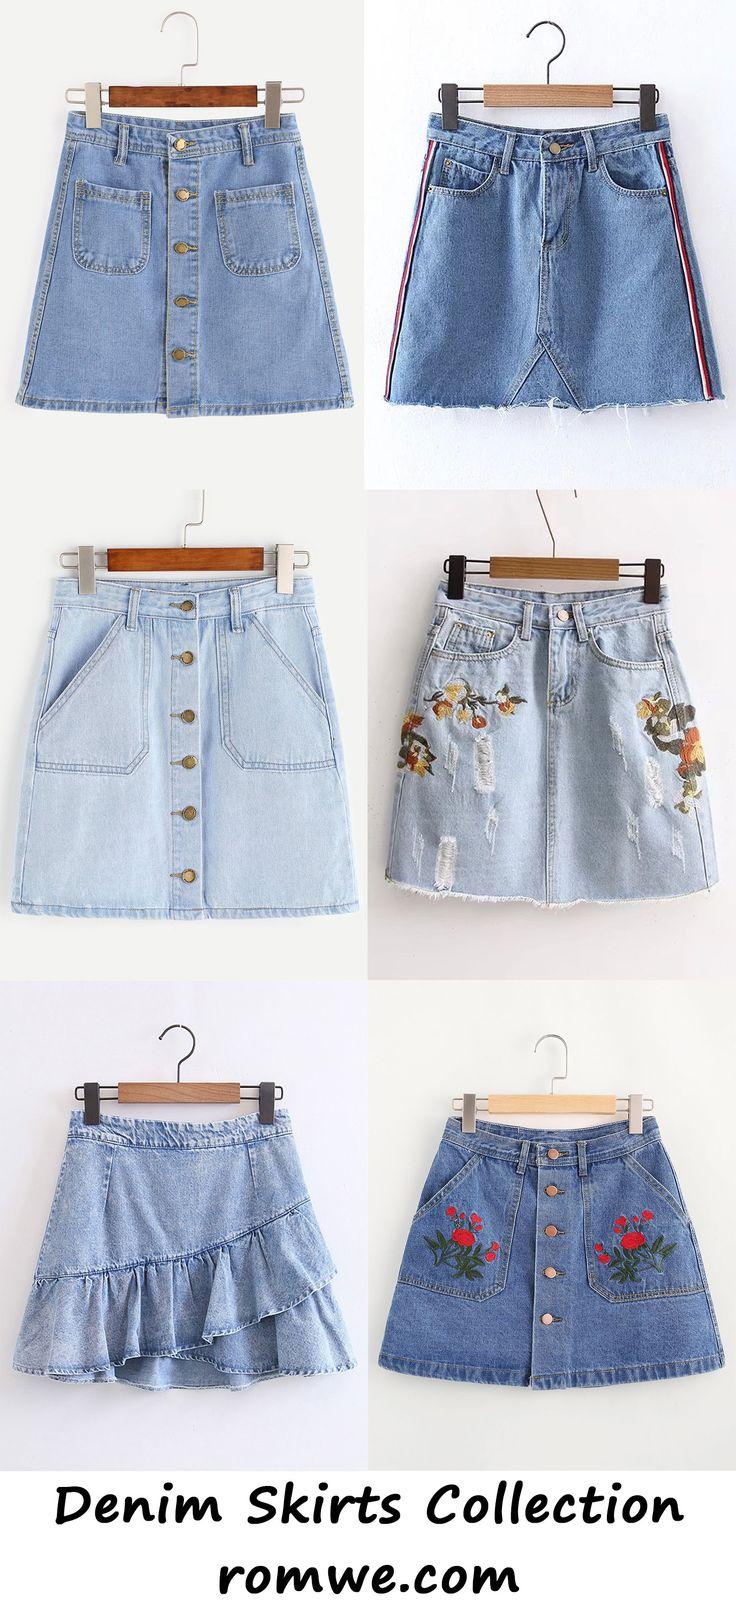 denim skirts collection 2017 - romwe.com